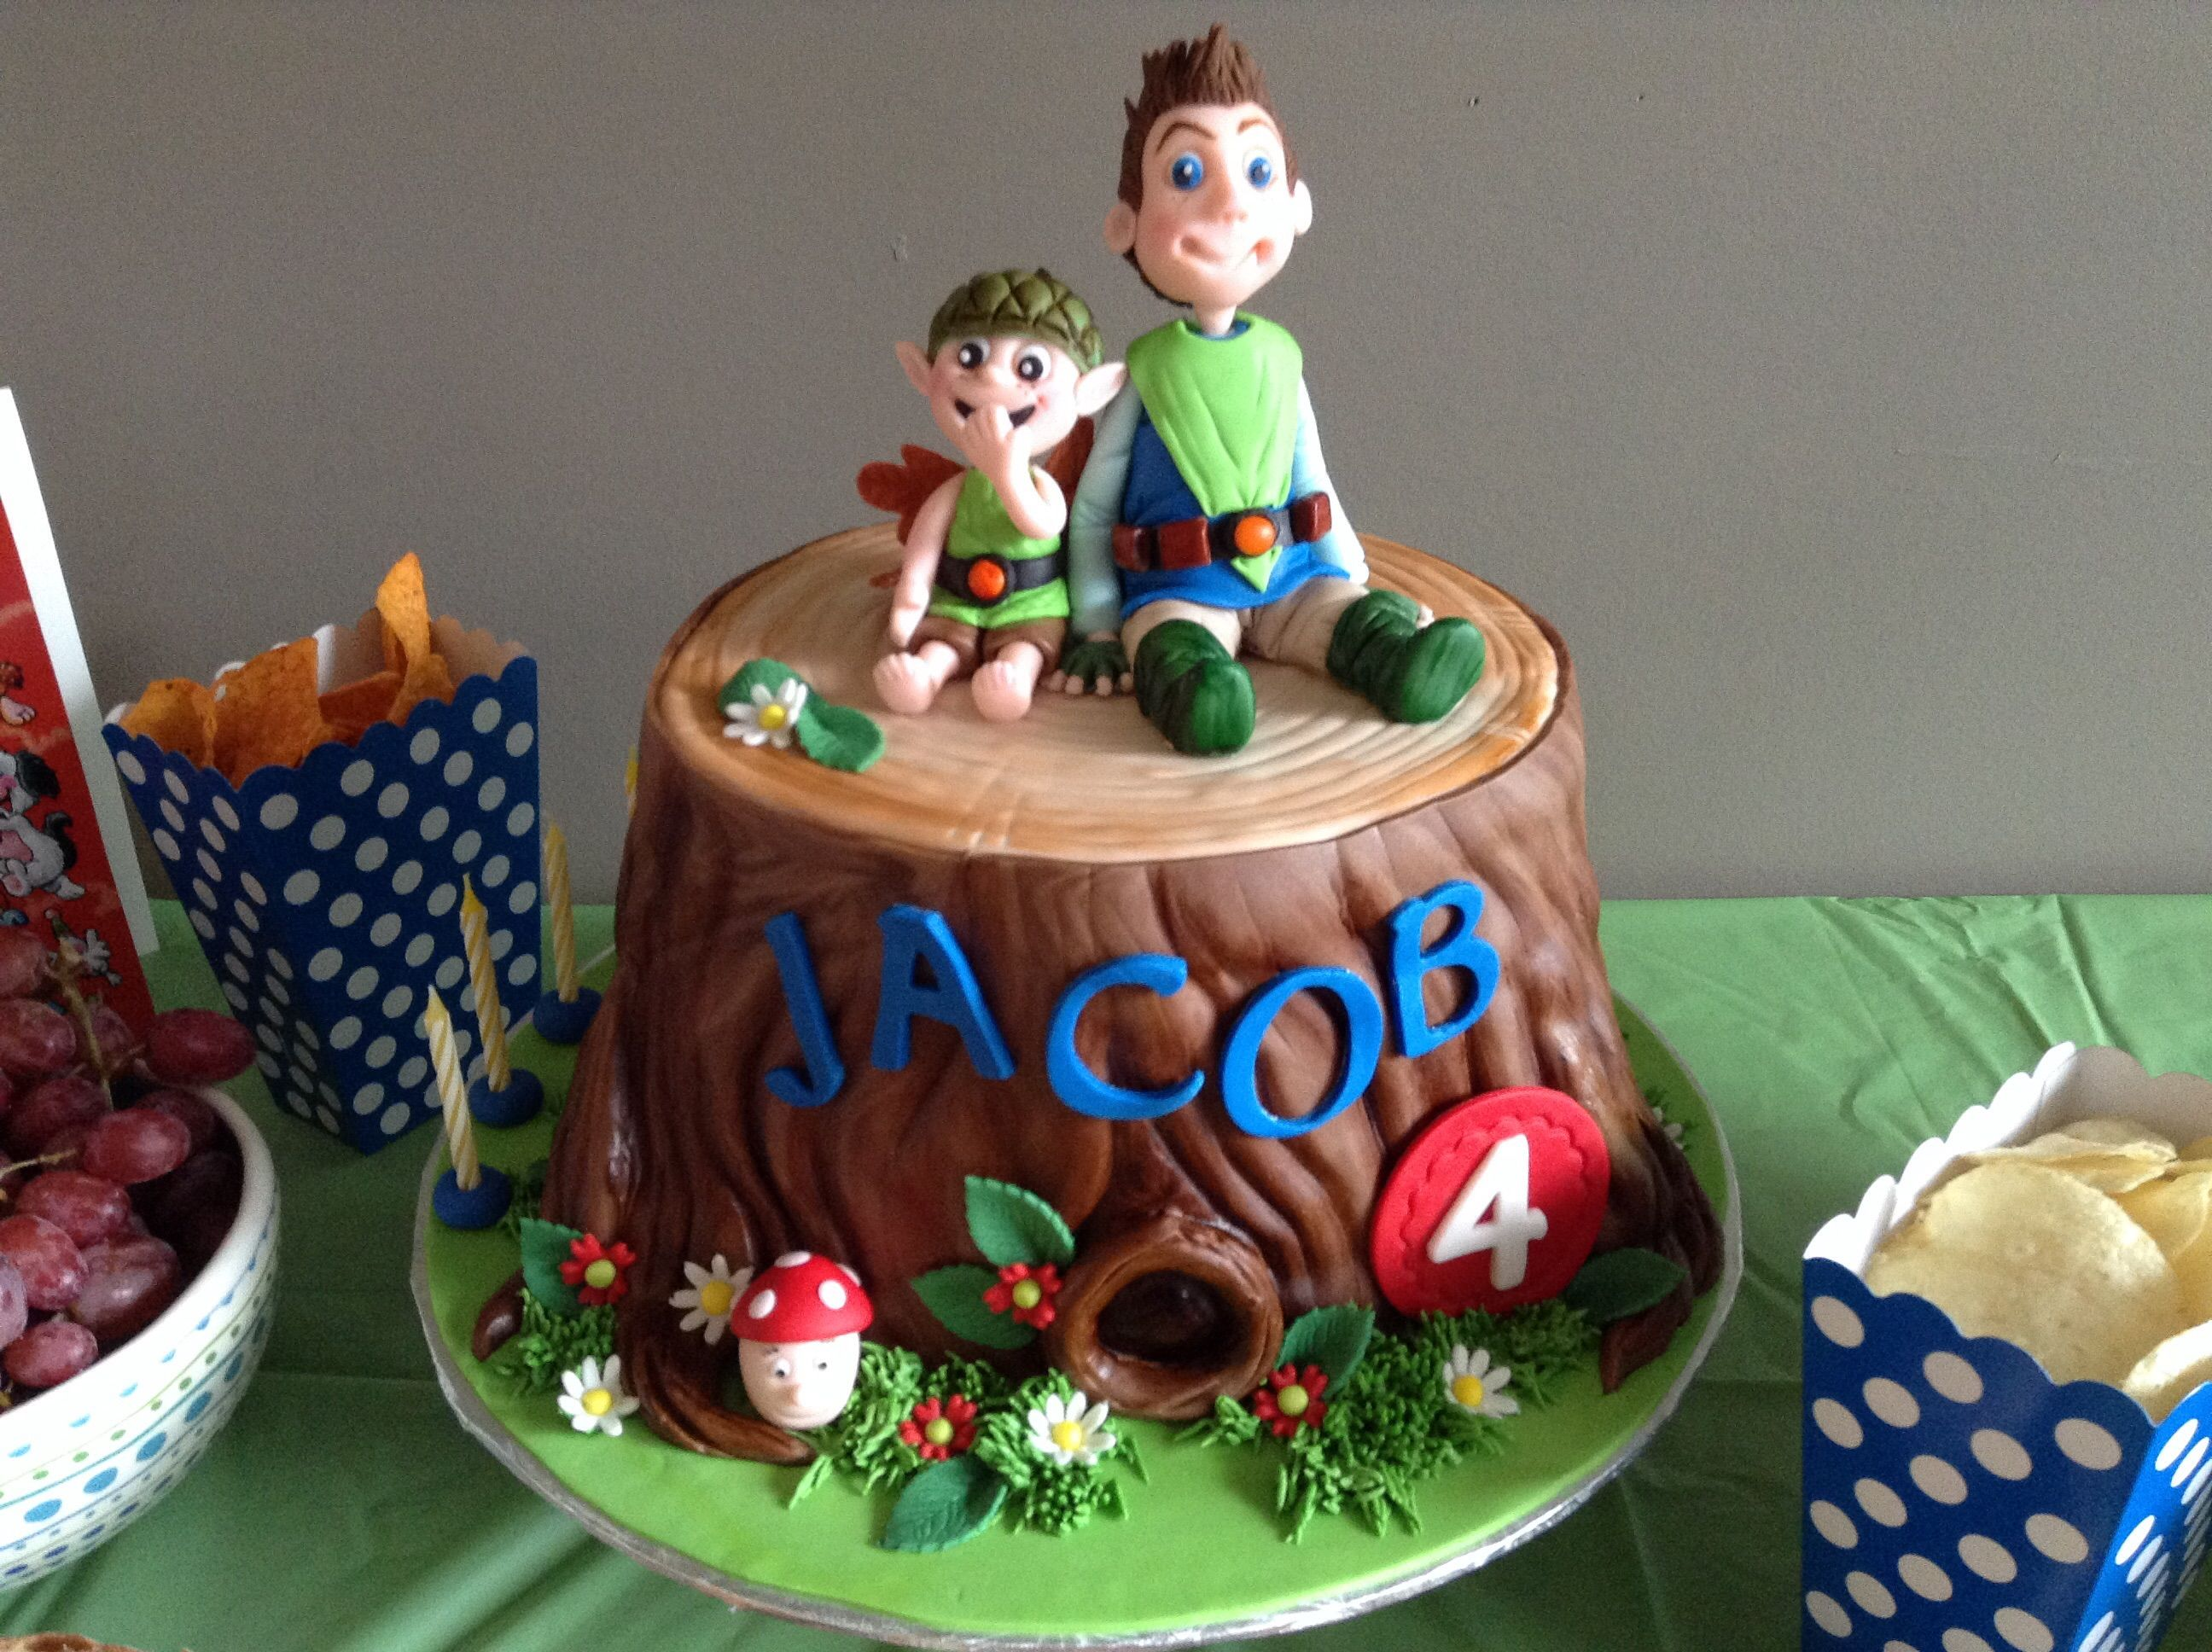 Fete De Jacob 4 Ans Tree Fu Tom Amazing Cake Tree Fu Tom Cakes